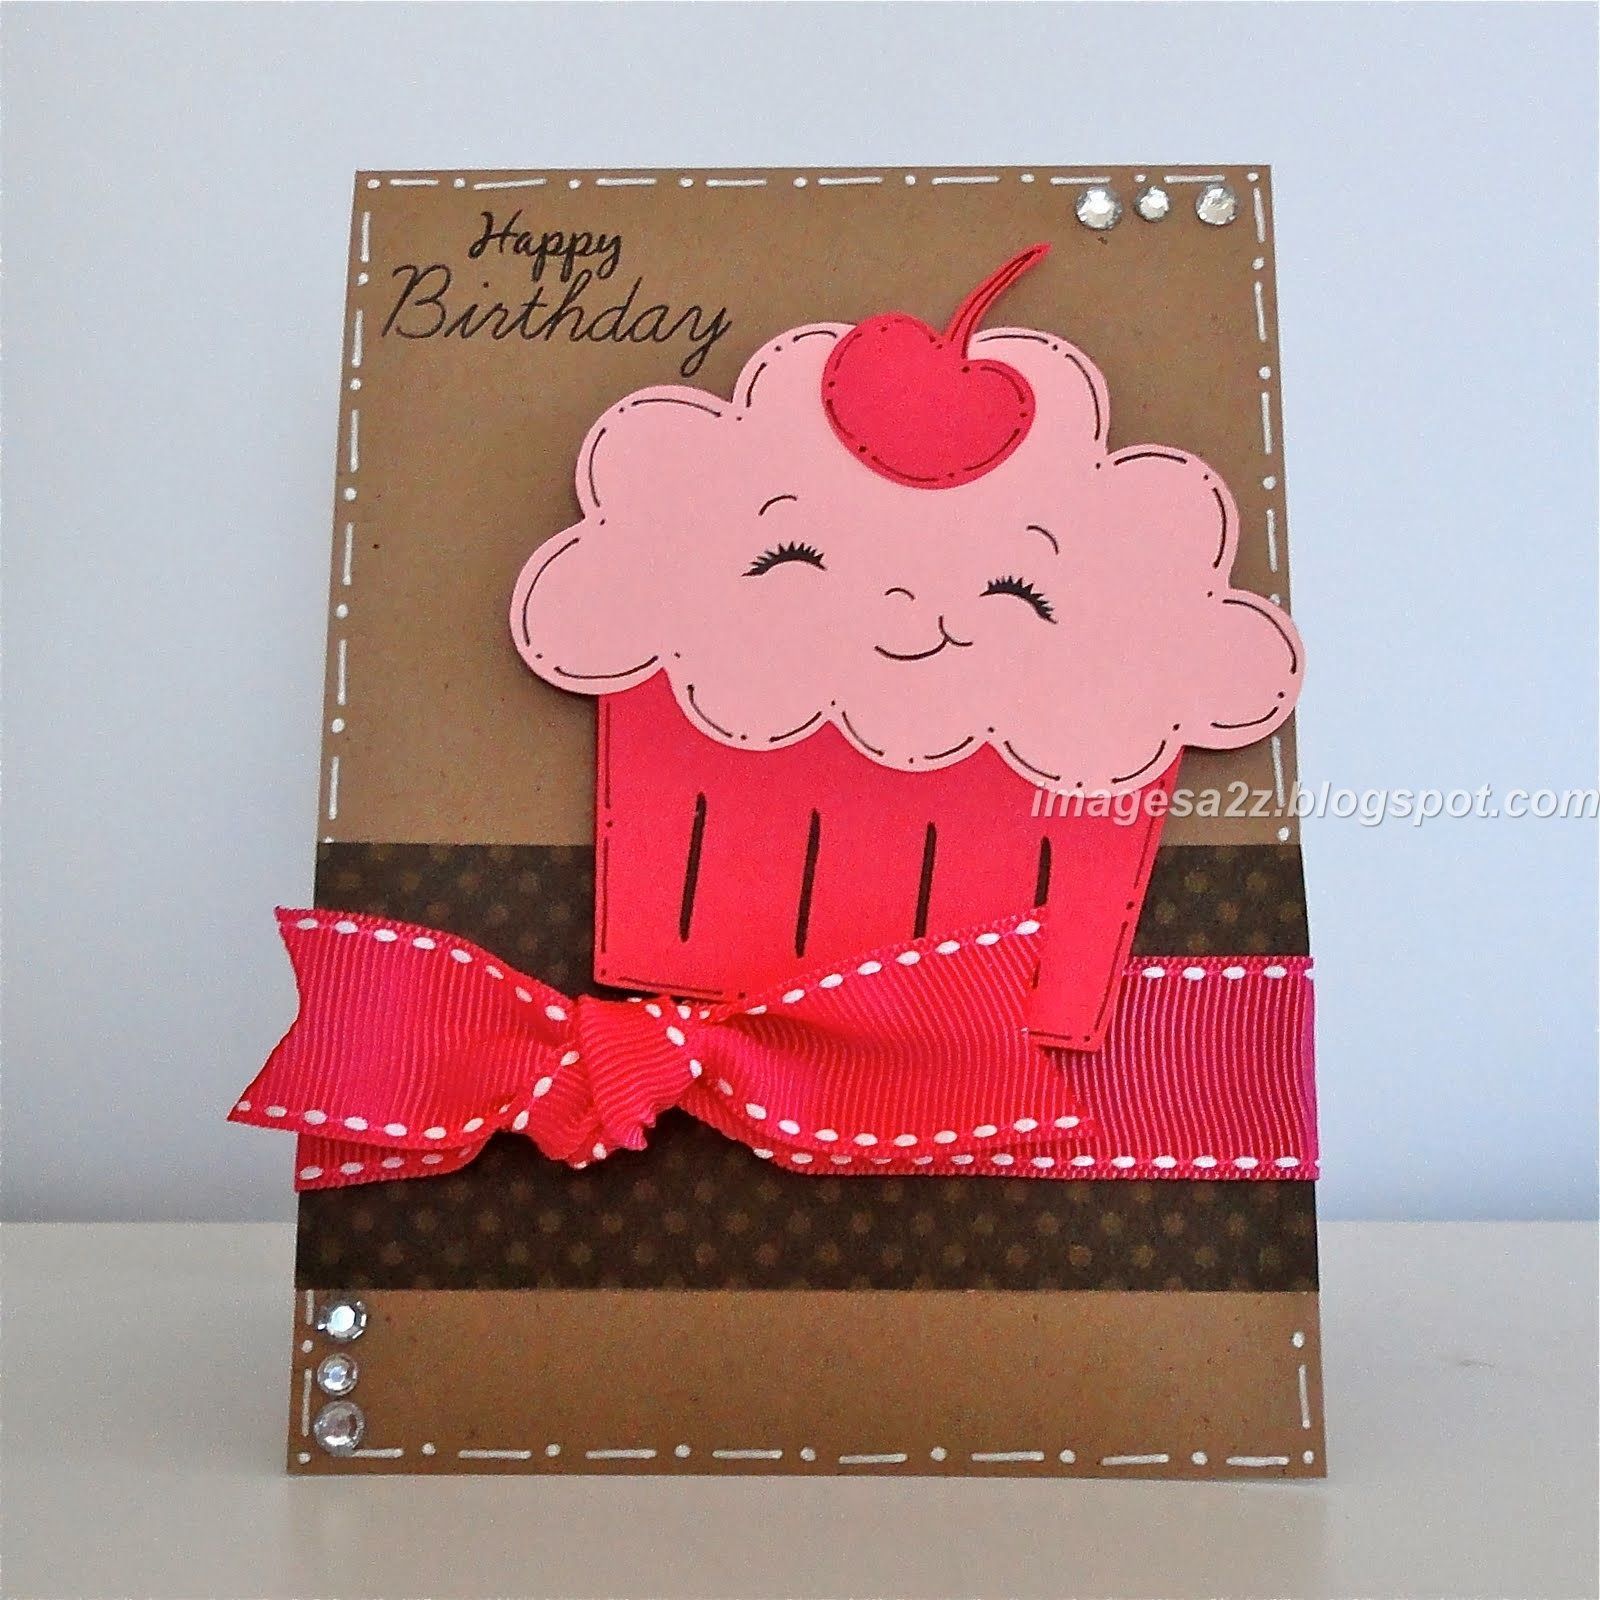 Exclusive Handmade Birthday Card Idea for Boyfriend Handmade4art – Ideas for Making a Birthday Card